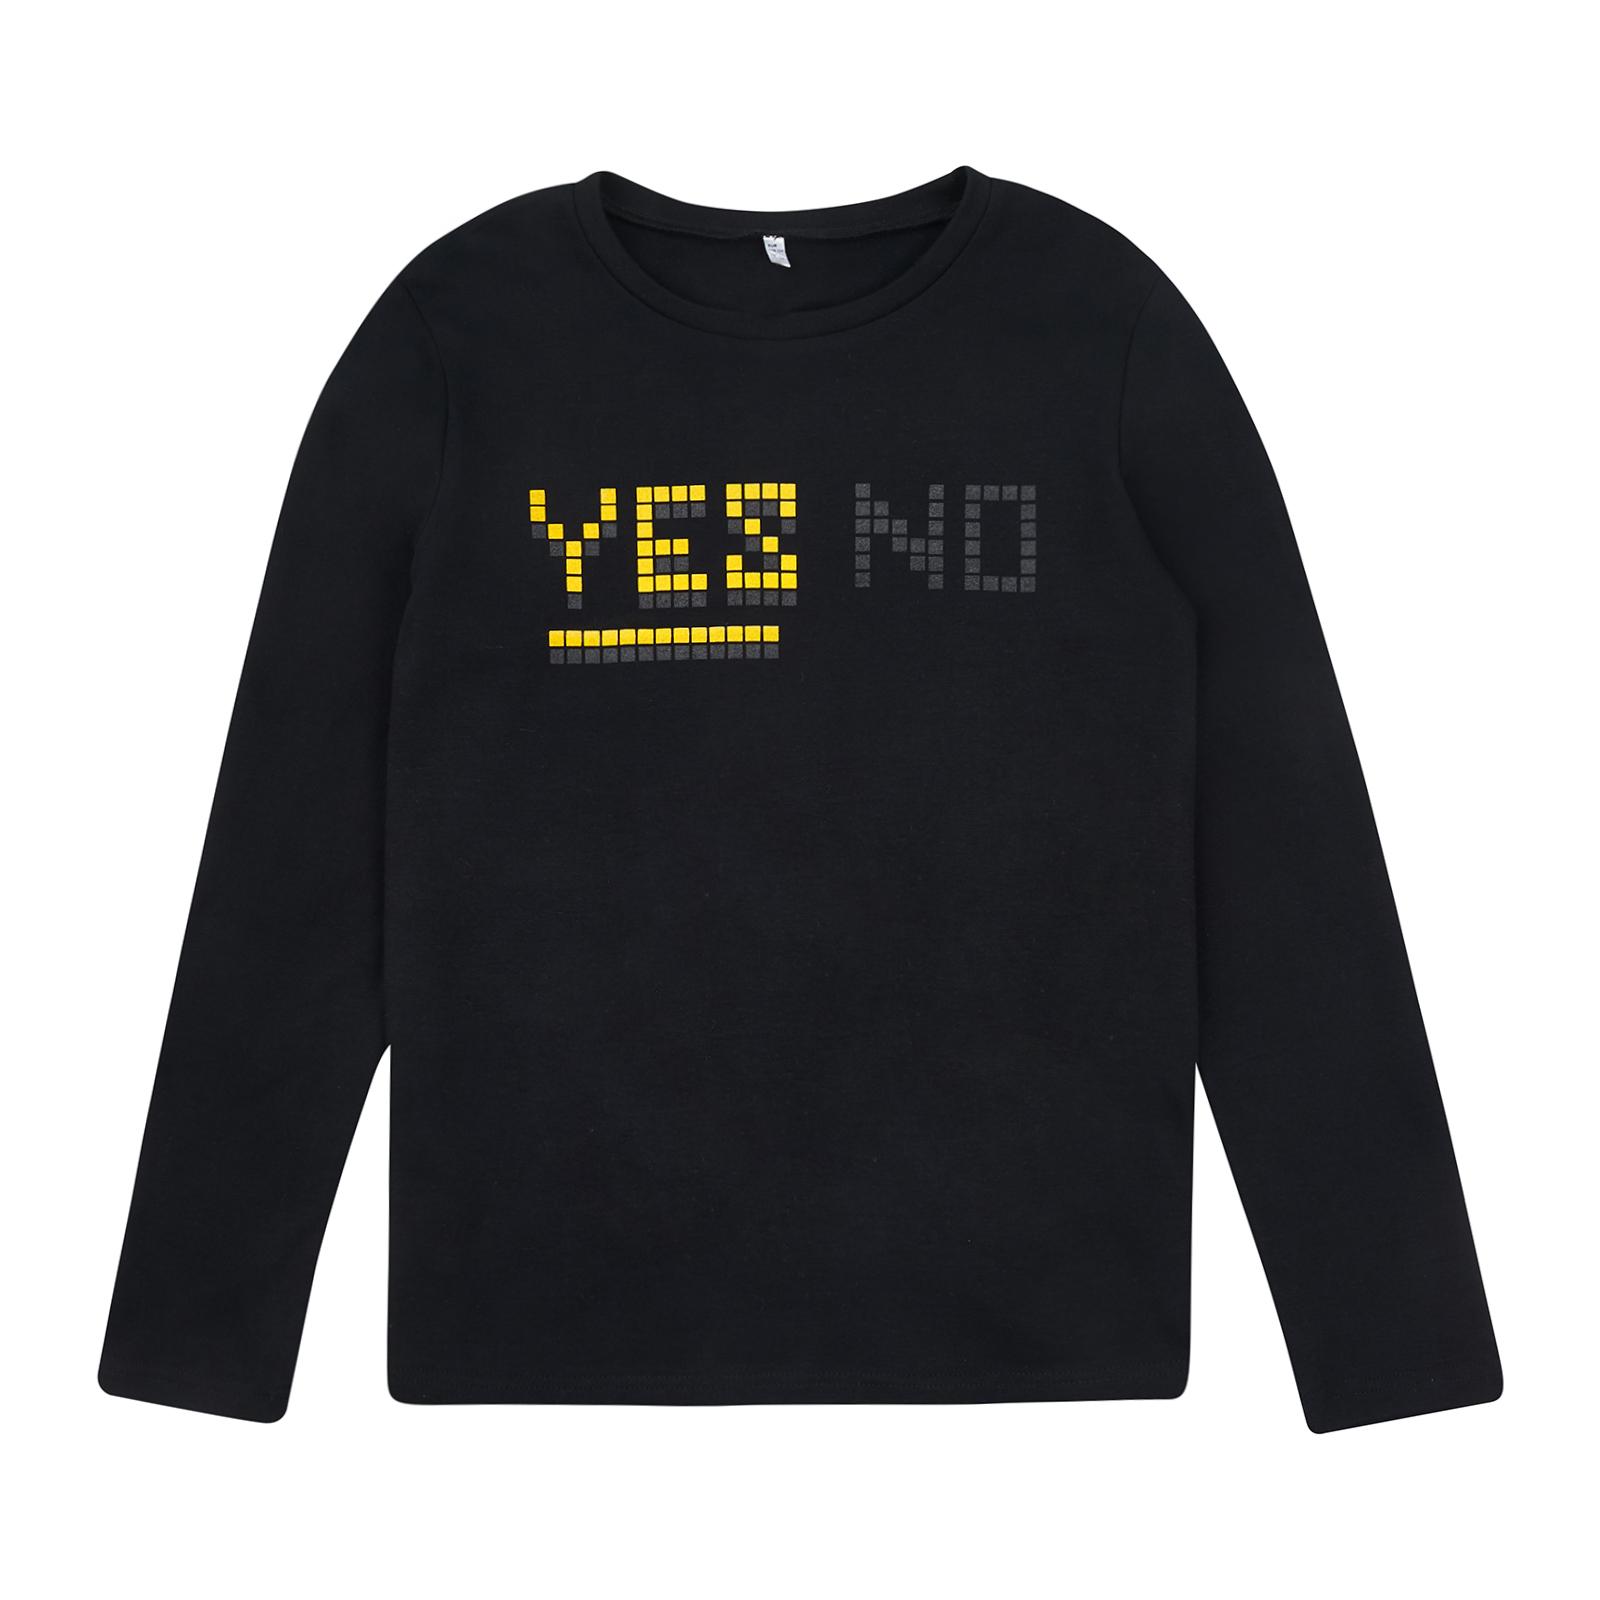 Реглан детские O! Kids Clothing модель OKC~96327-5 , 2017